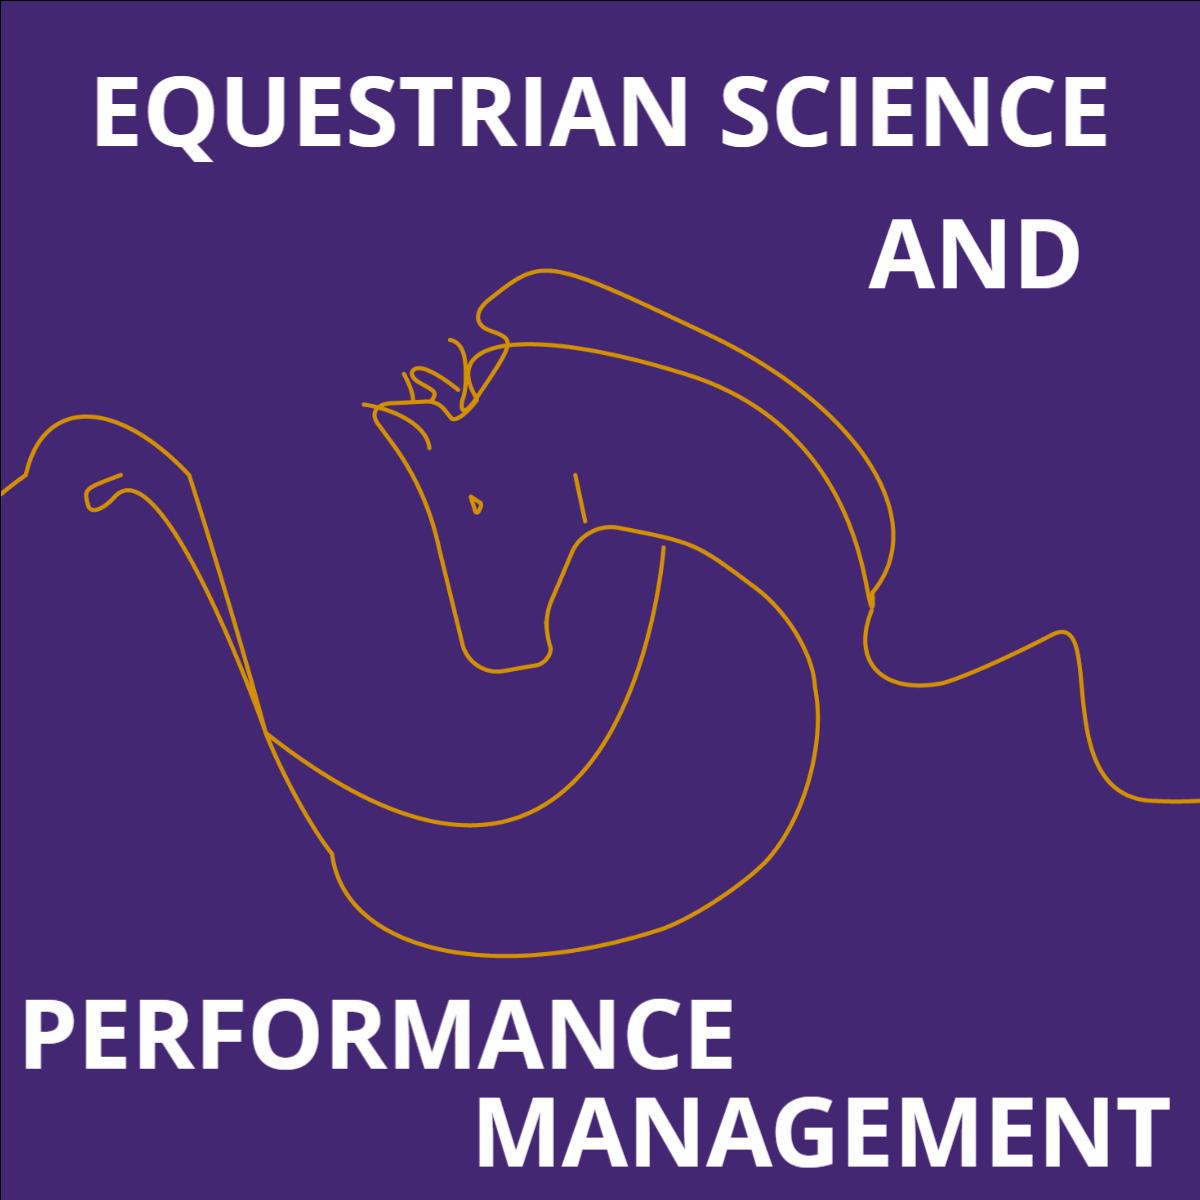 Equestrian Science